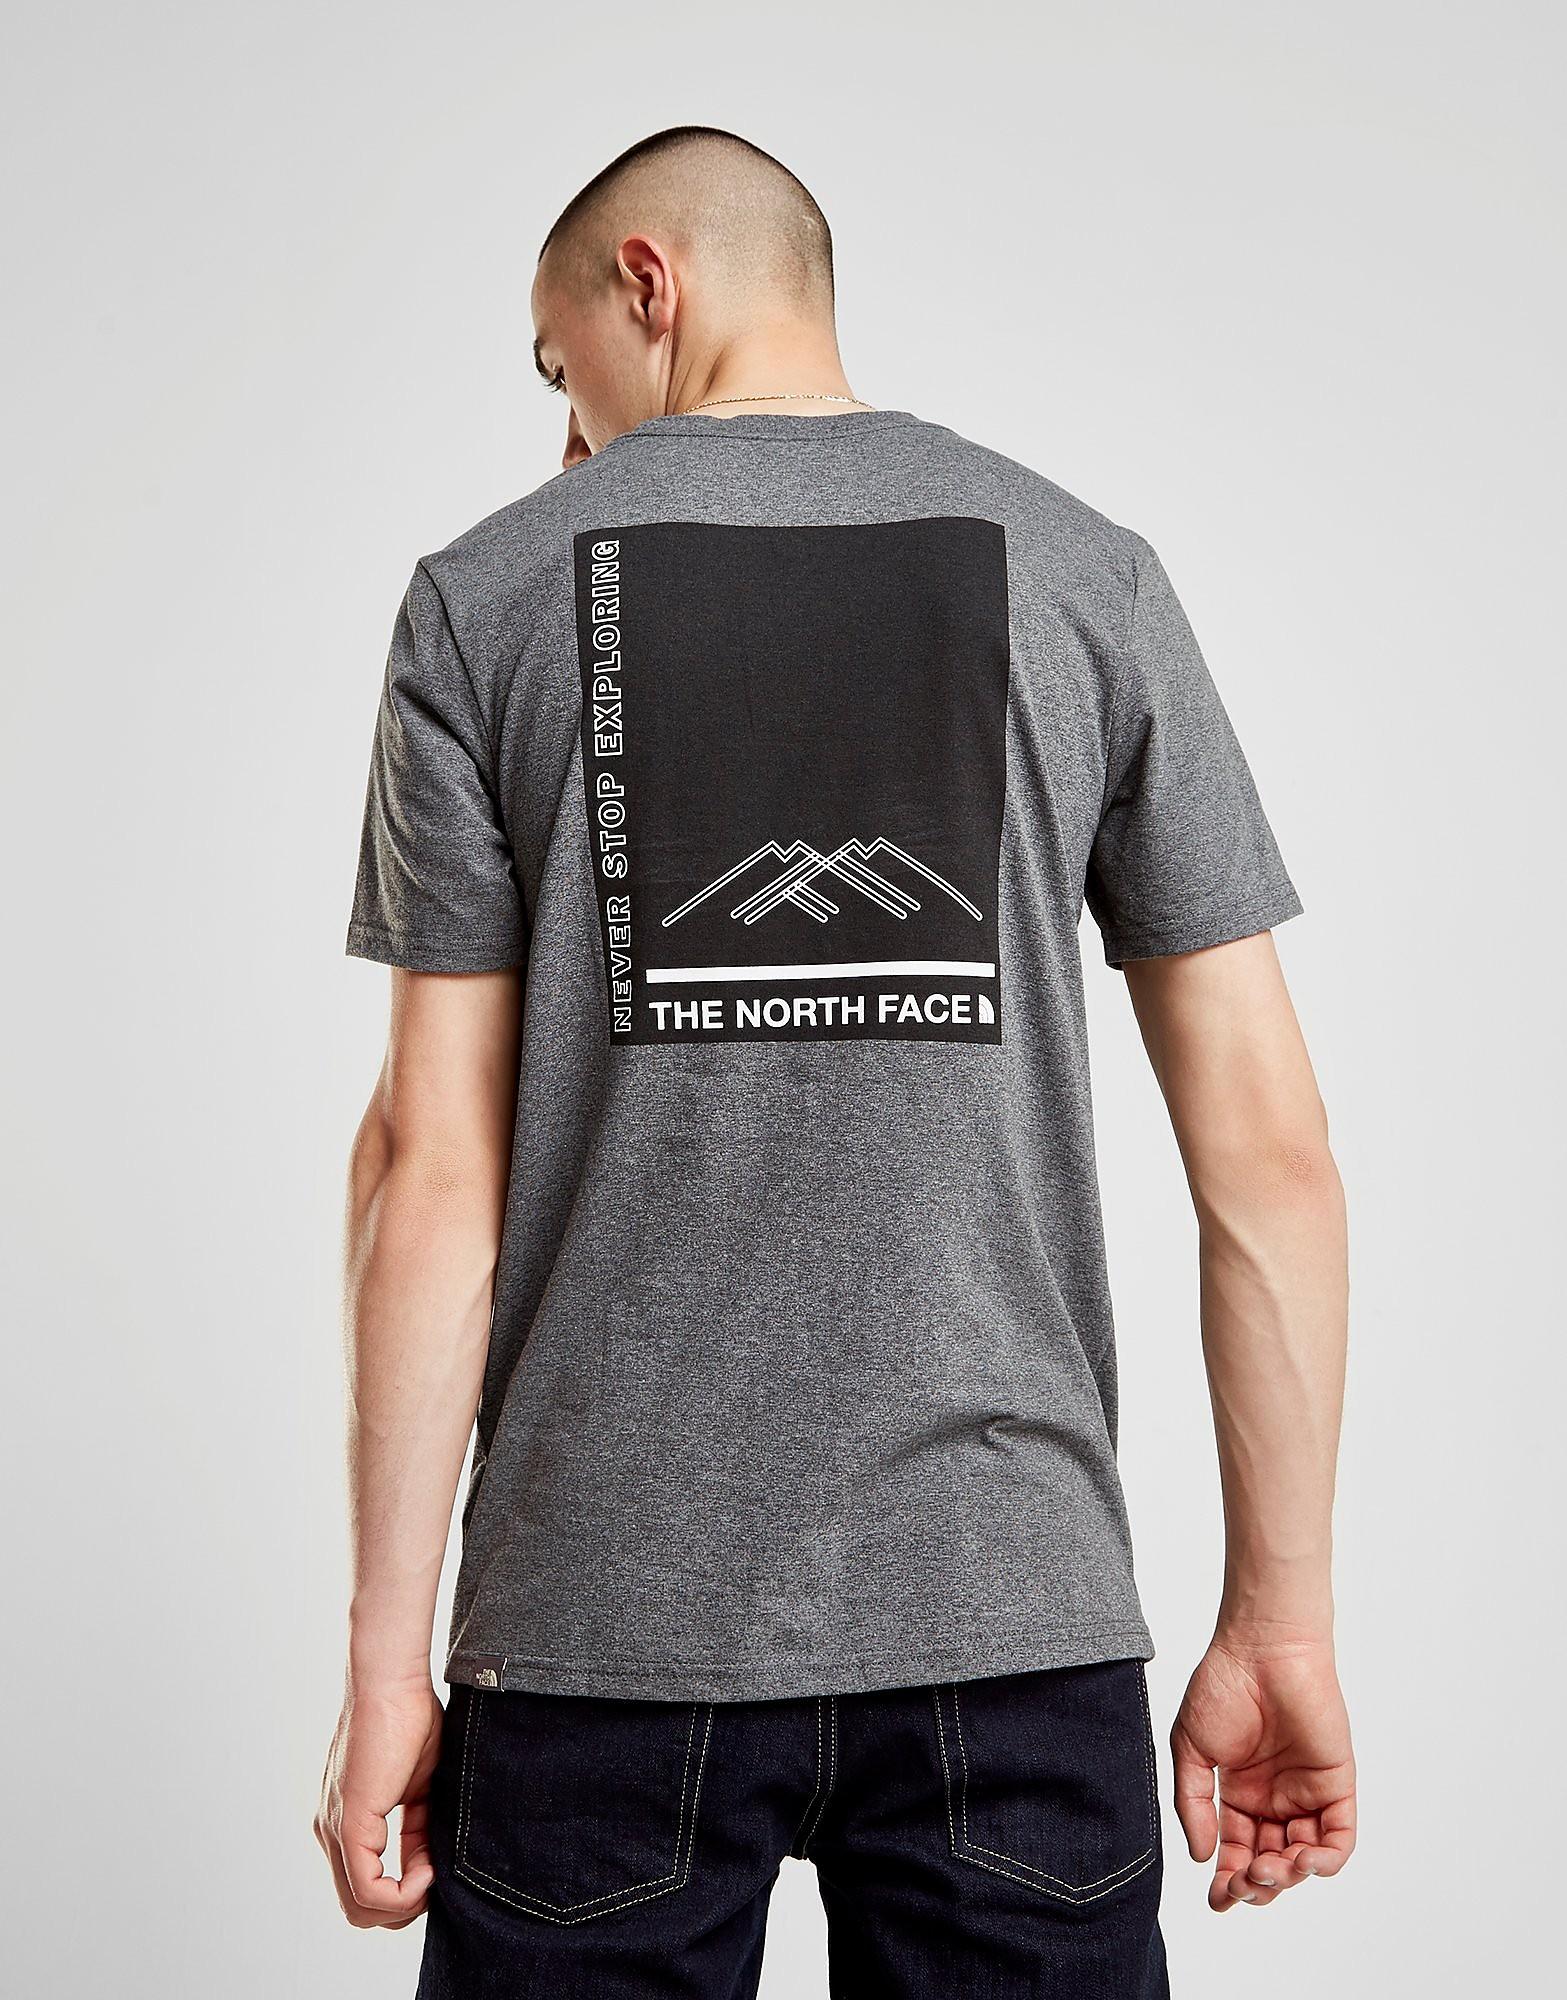 The North Face camiseta Mountain Box